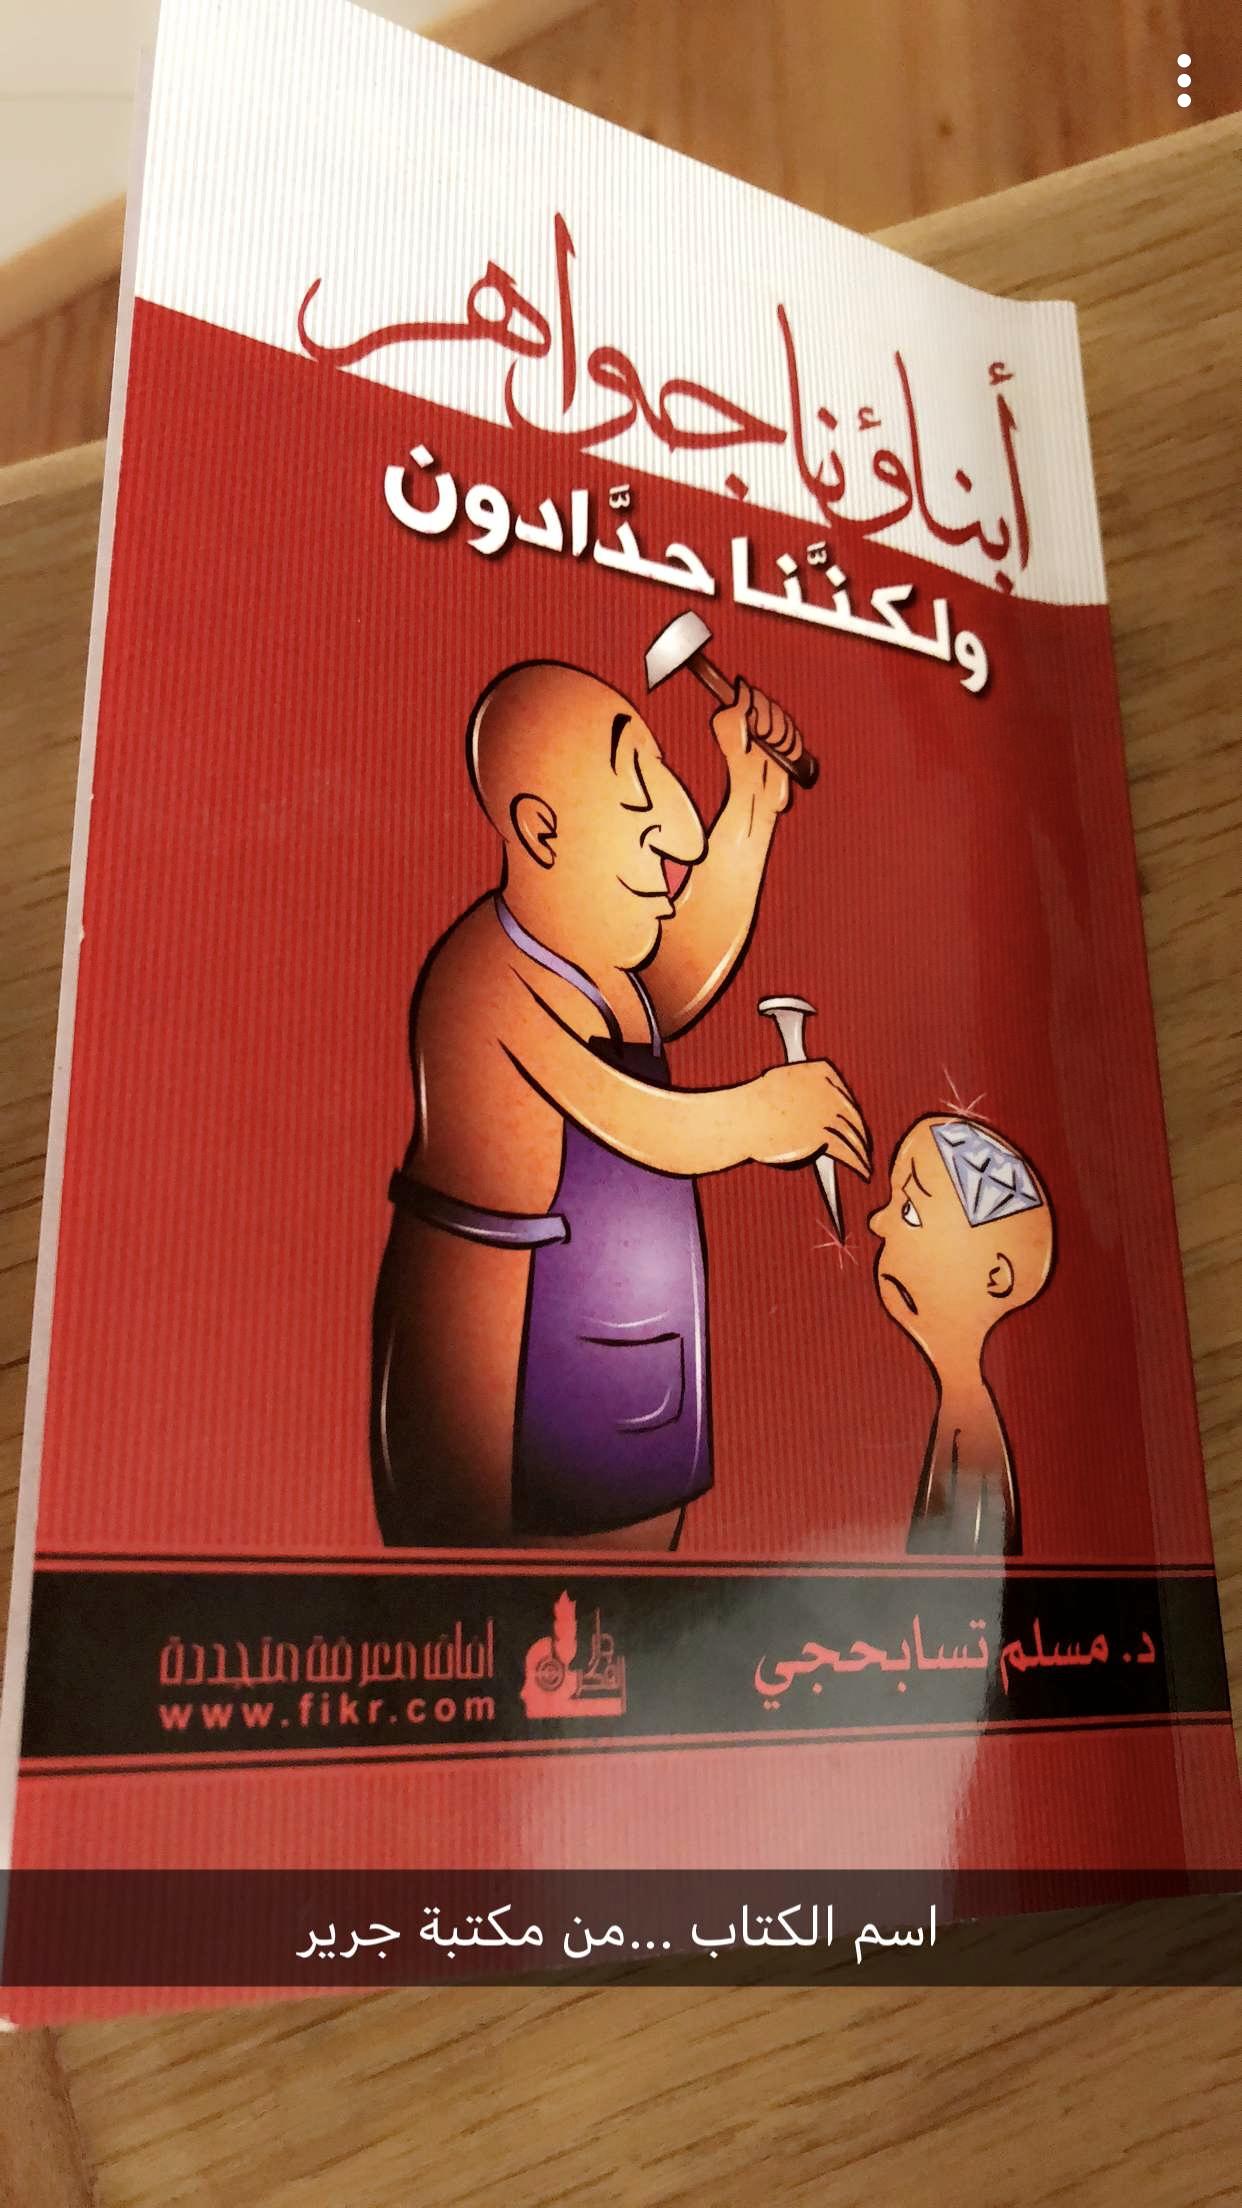 Pin By Malak On Books ك تب Book Club Books Books Ebooks Free Books